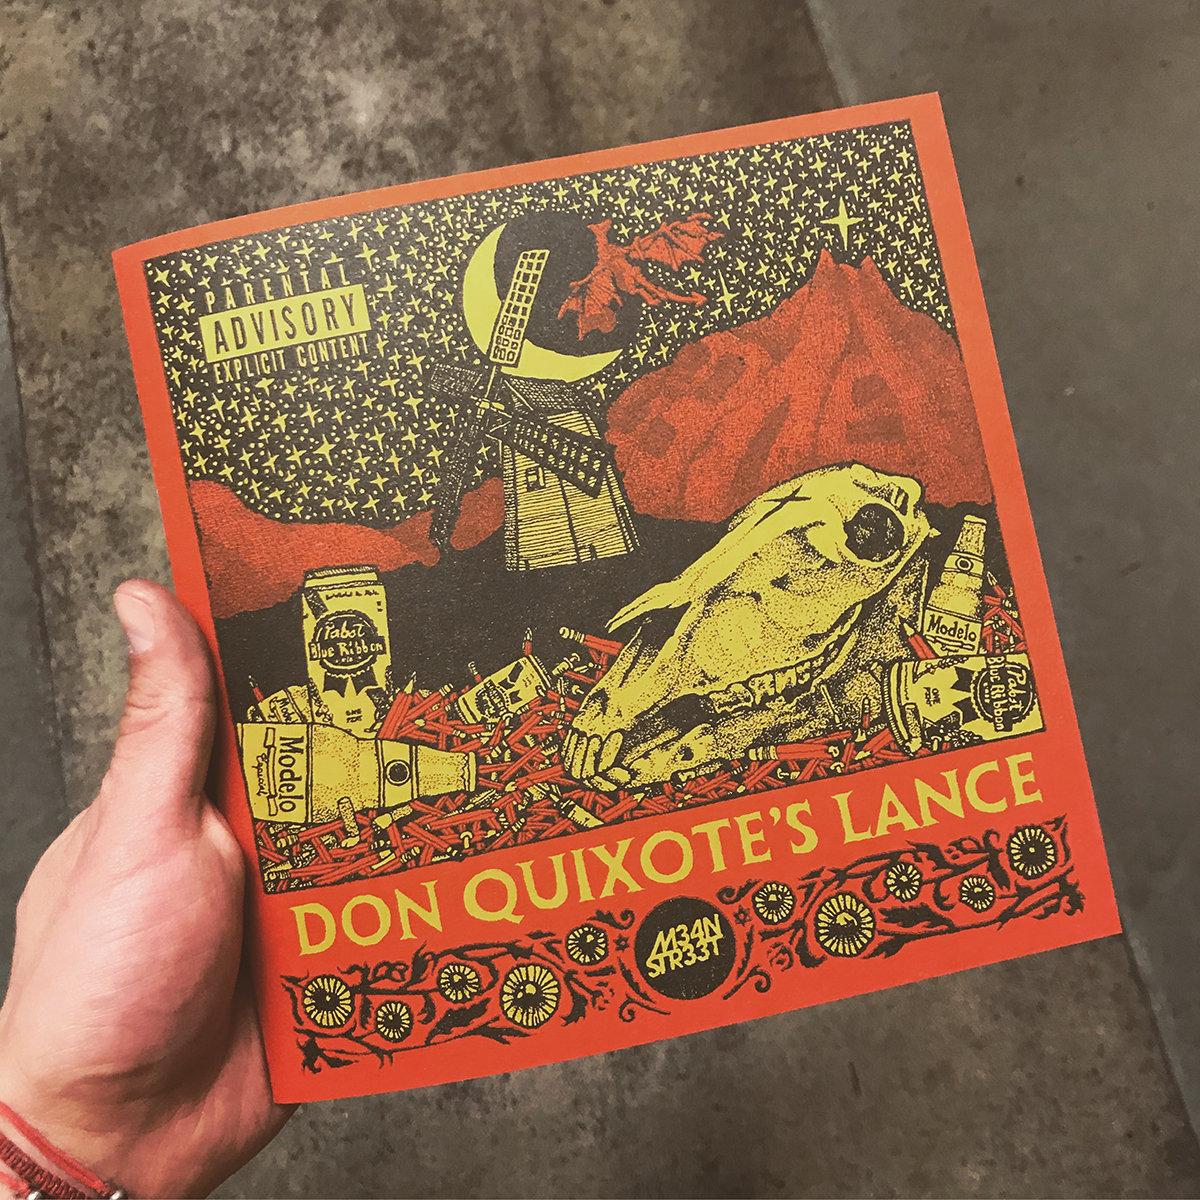 DON QUIXOTE'S LANCE | M34N STR33T